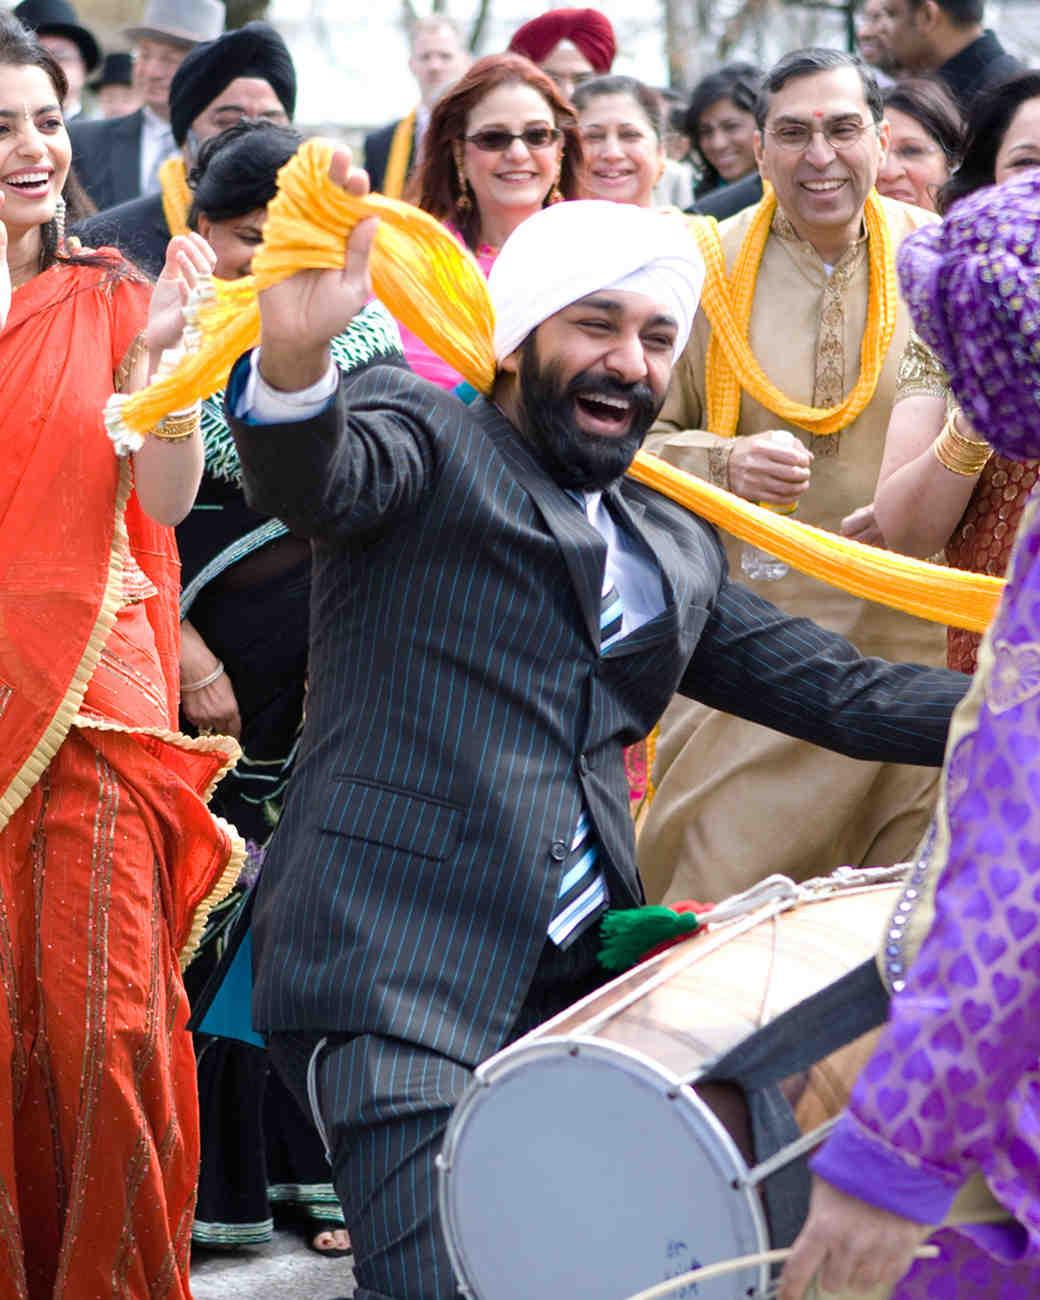 hindu-wedding-traditions-groom-dancing-toronto-somina-gaurav-travel09-0615.jpg